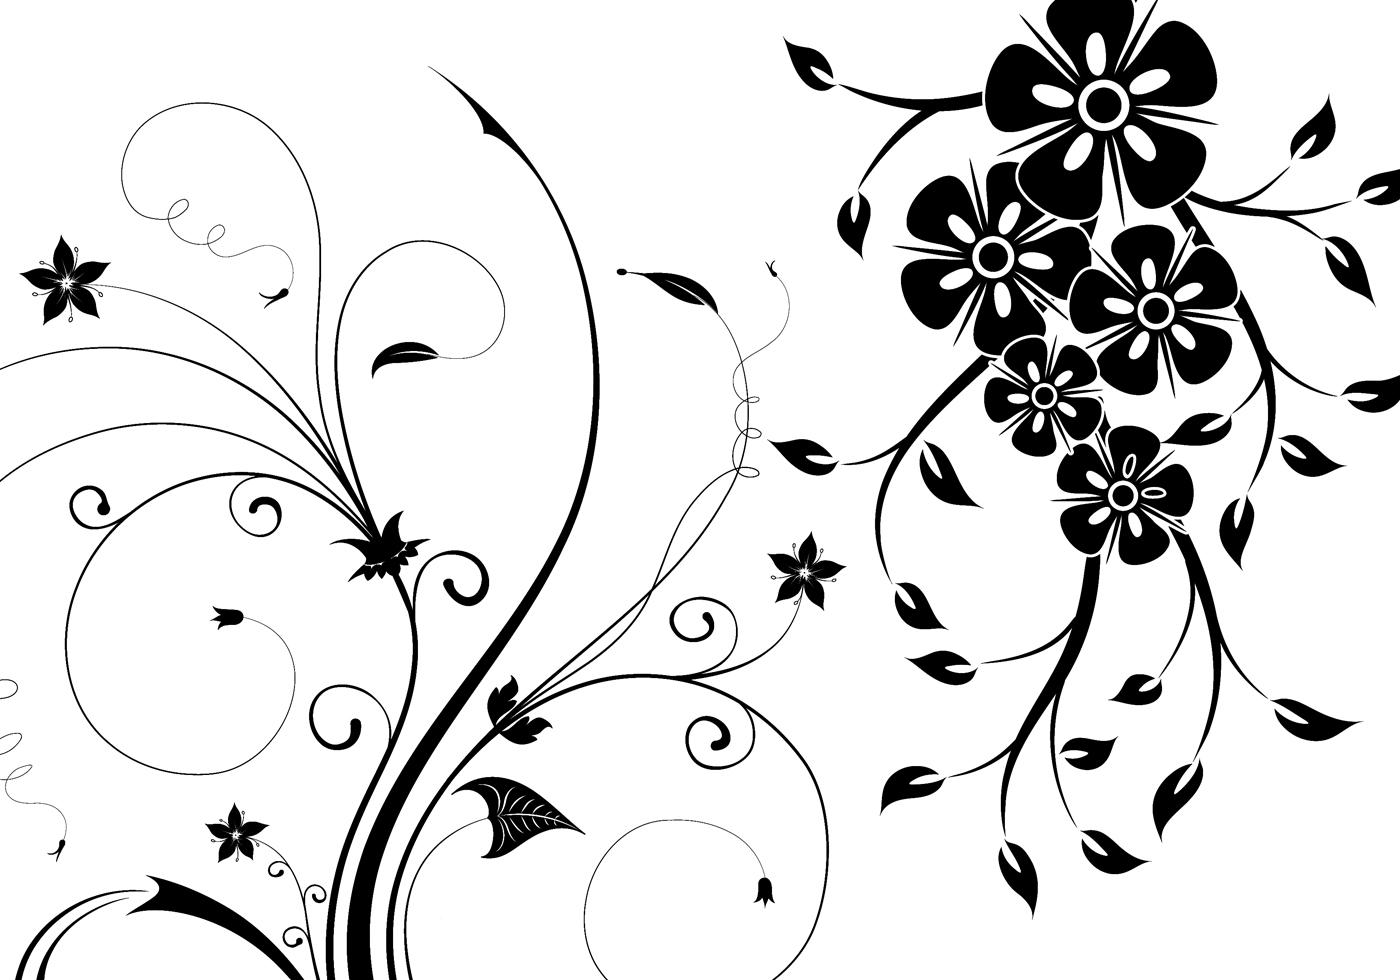 Free Floral Swirls Brushes